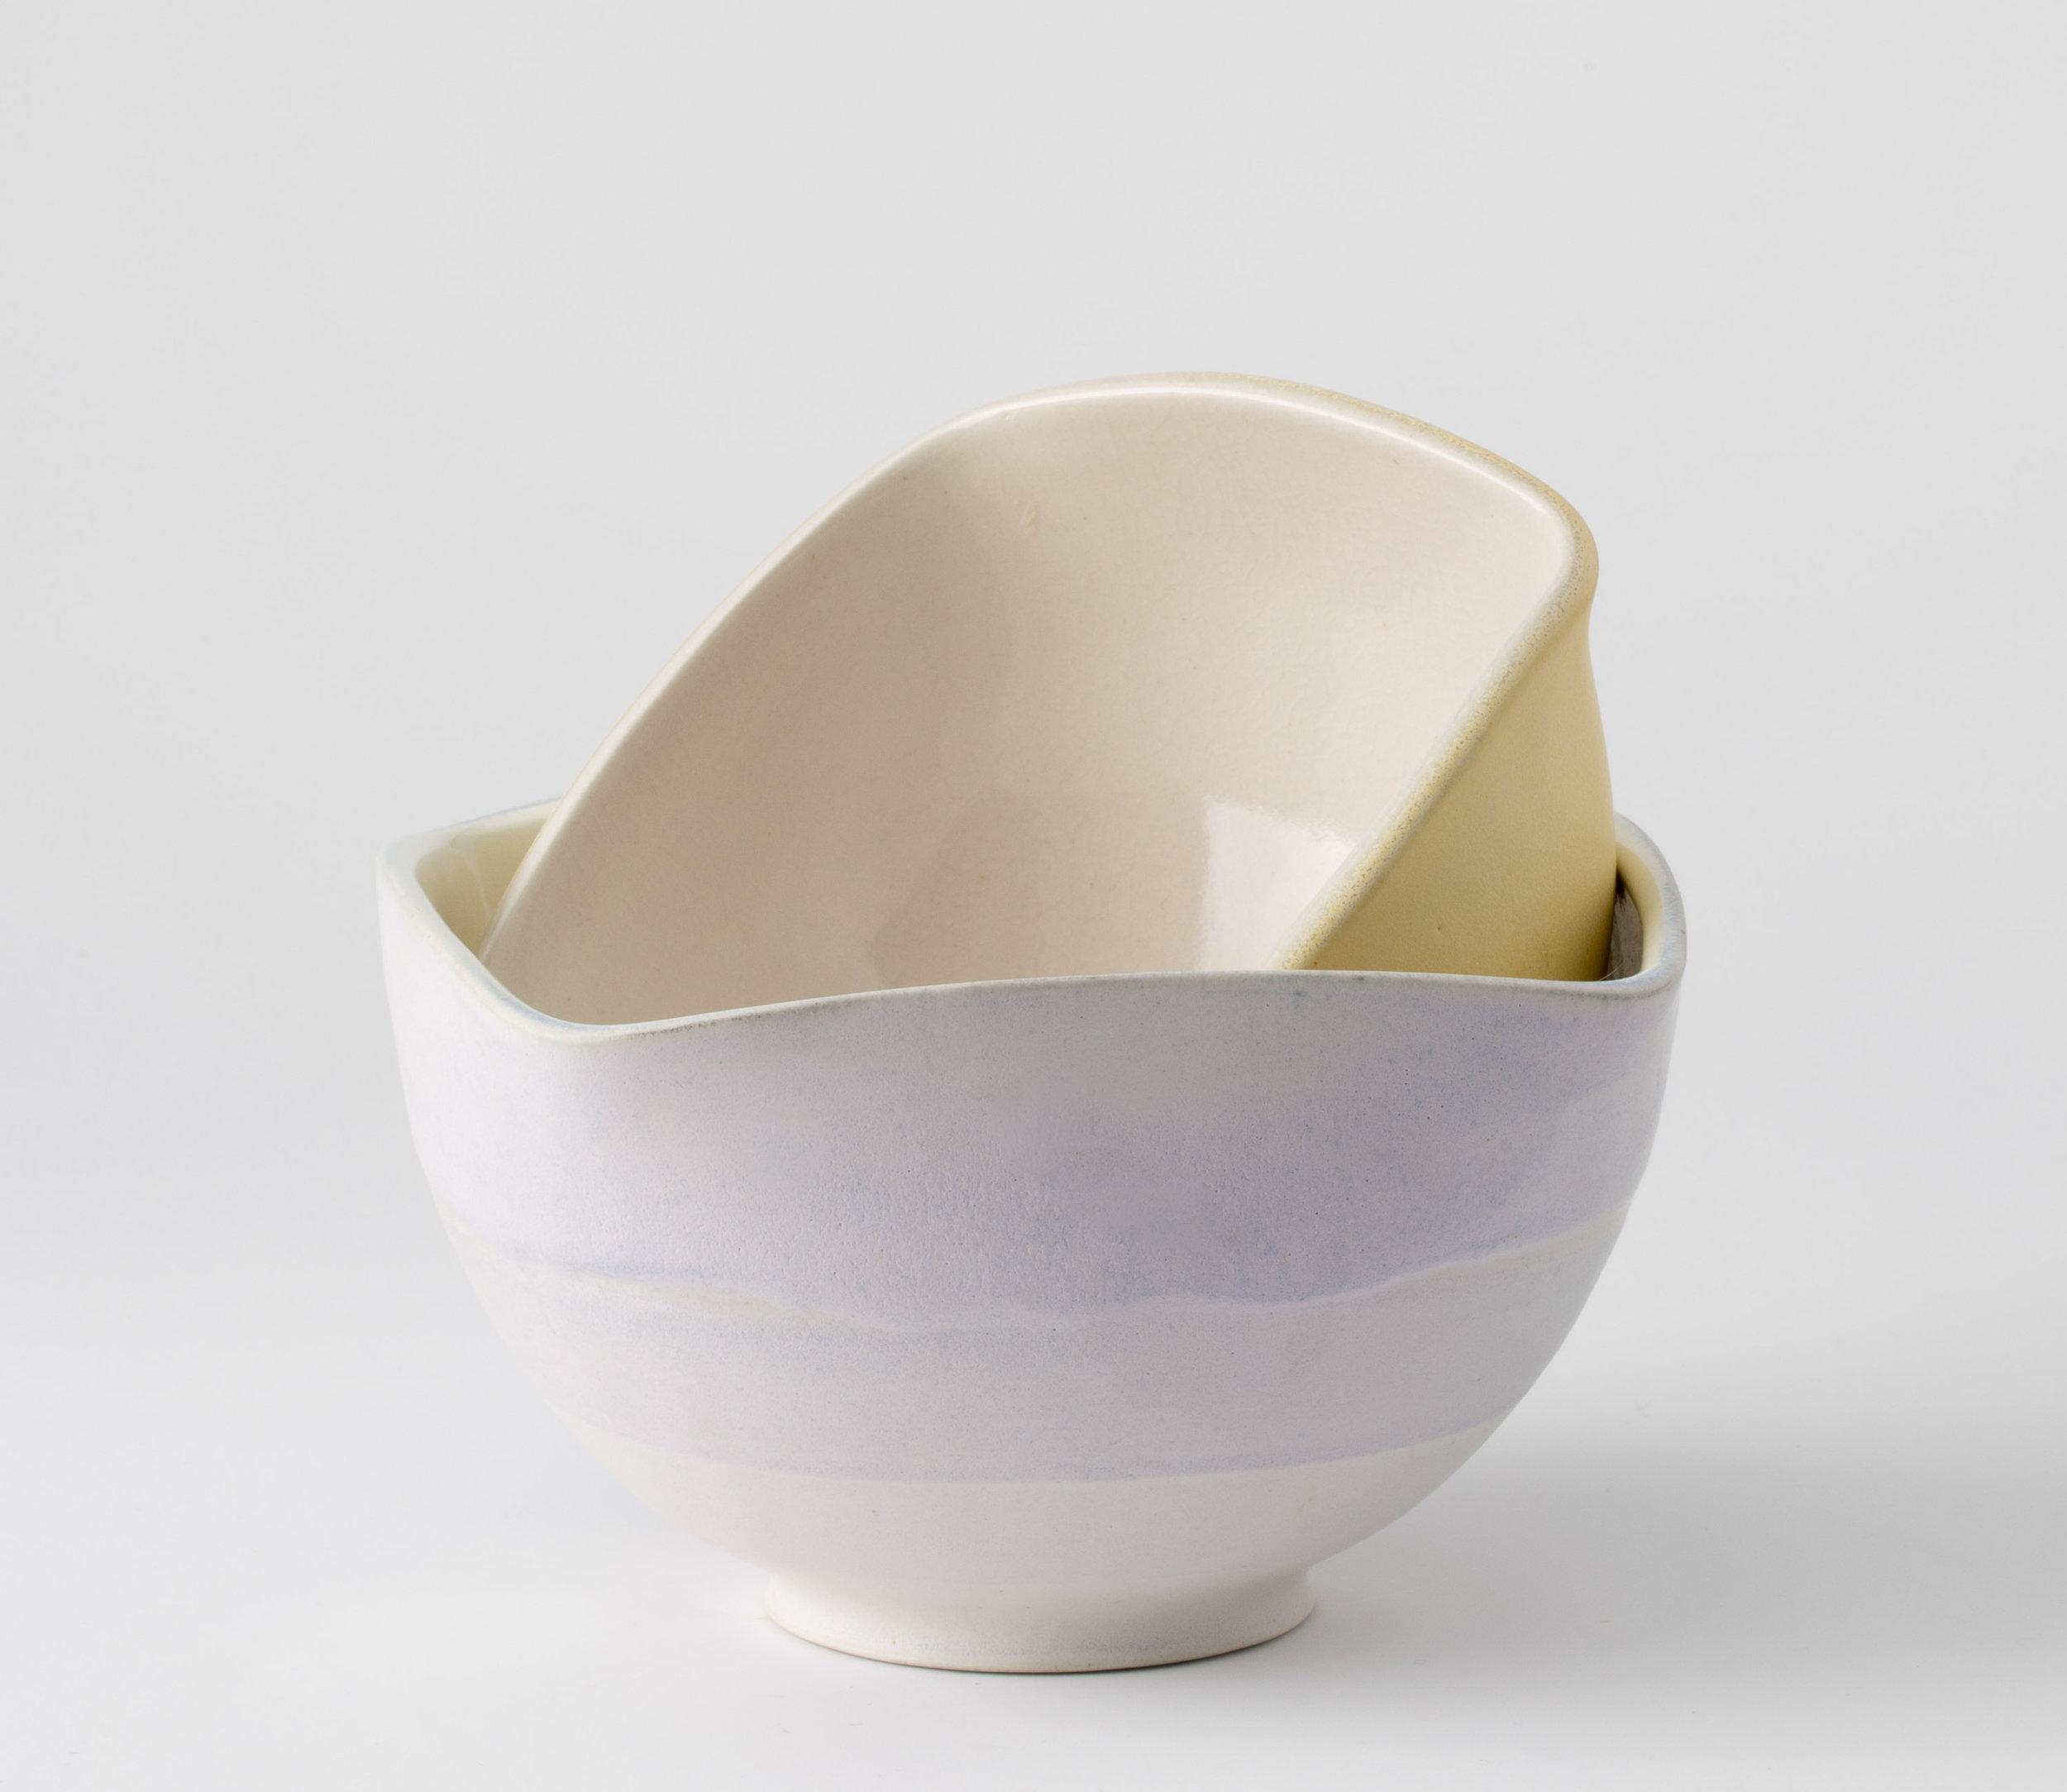 "Squared Bowls  Cone 10 Oxidation Porcelain  Bottom Bowl 7"" W x 7.25"" H  2016"